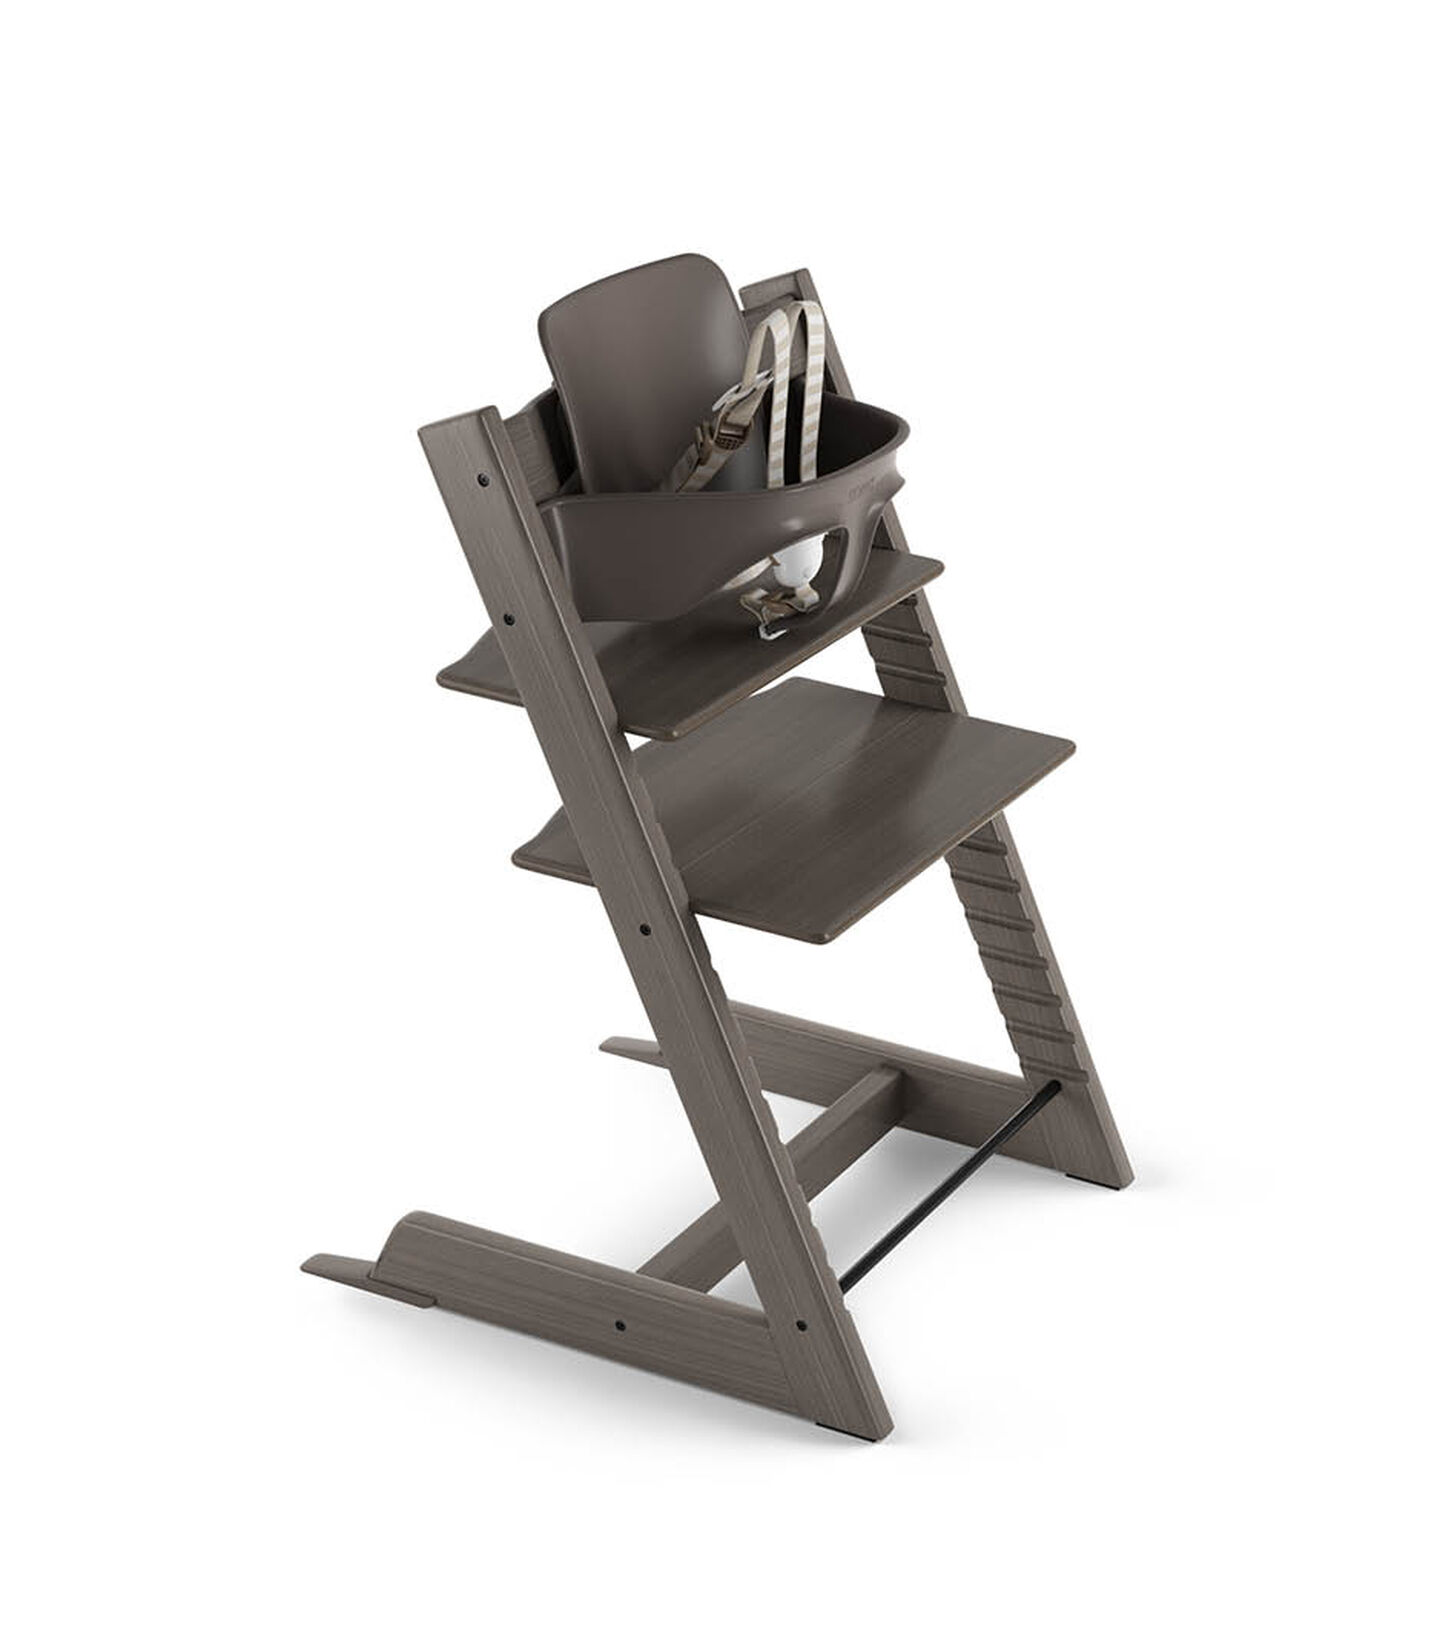 Tripp Trapp® Bundle High Chair US 18 Hazy Grey, Hazy Grey, mainview view 1